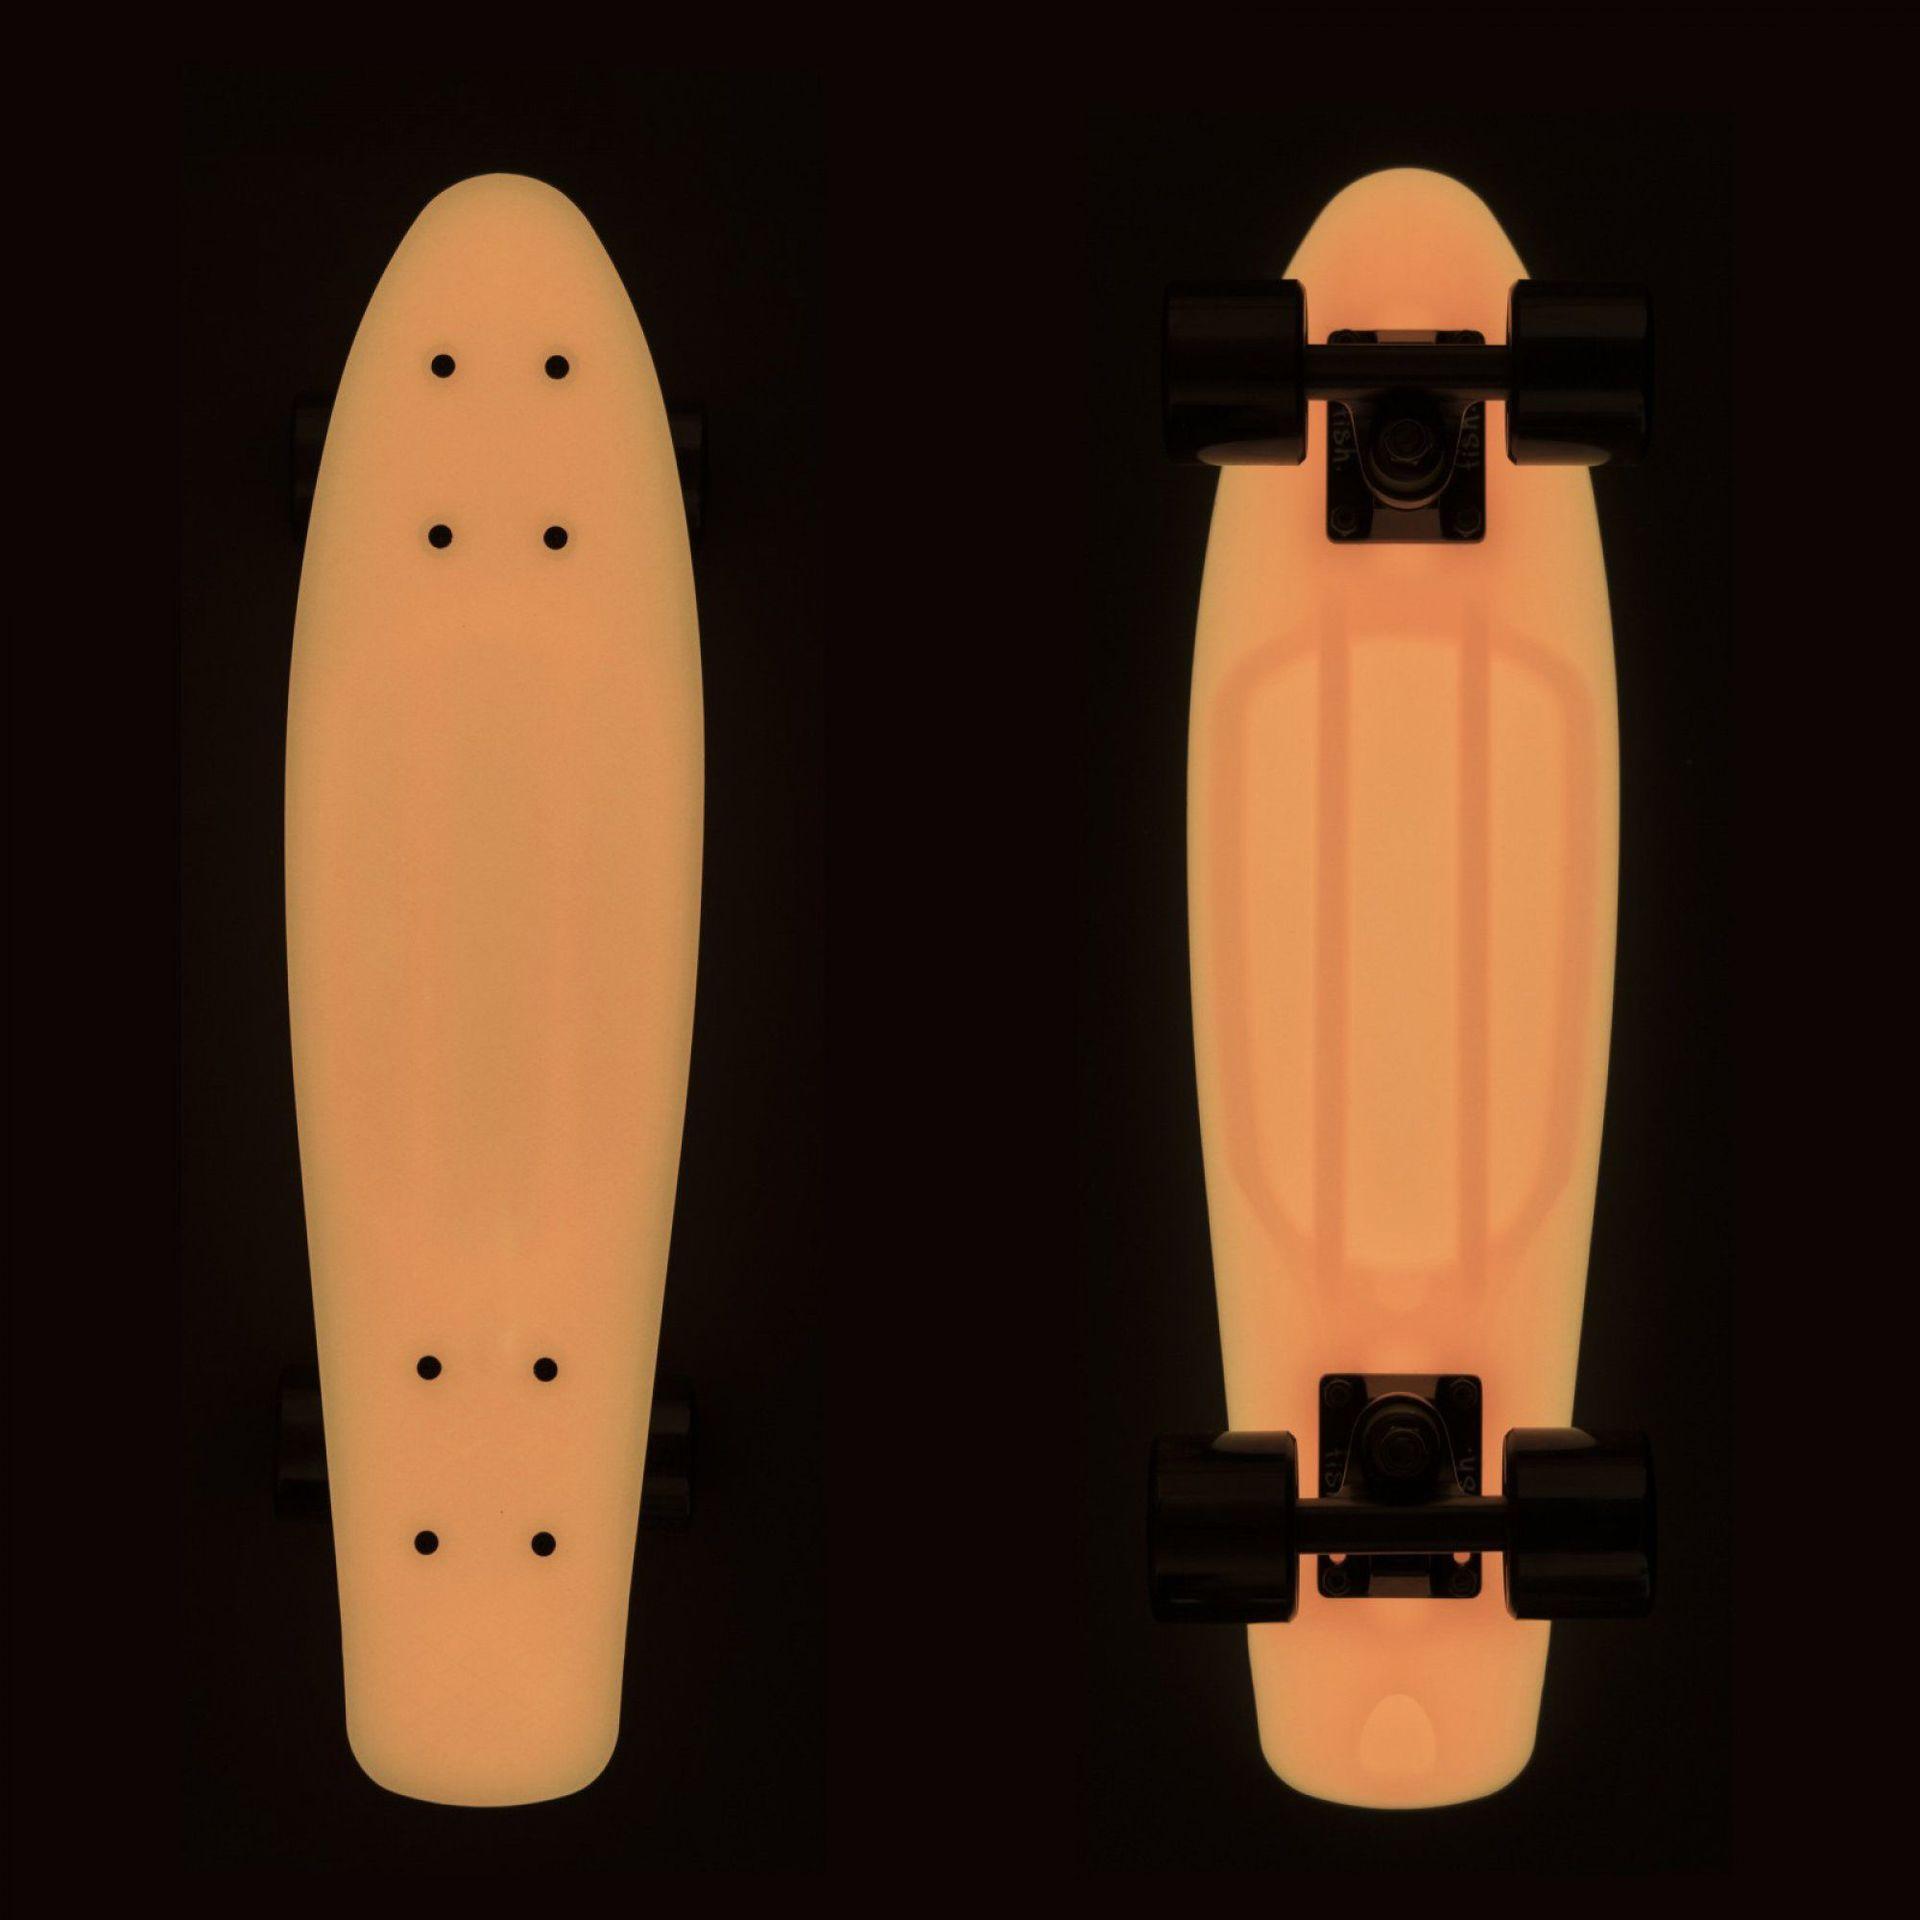 FISHBOARD FISH SKATEBOARDS CLASSIC GLOW ORANGE|BLACK 3